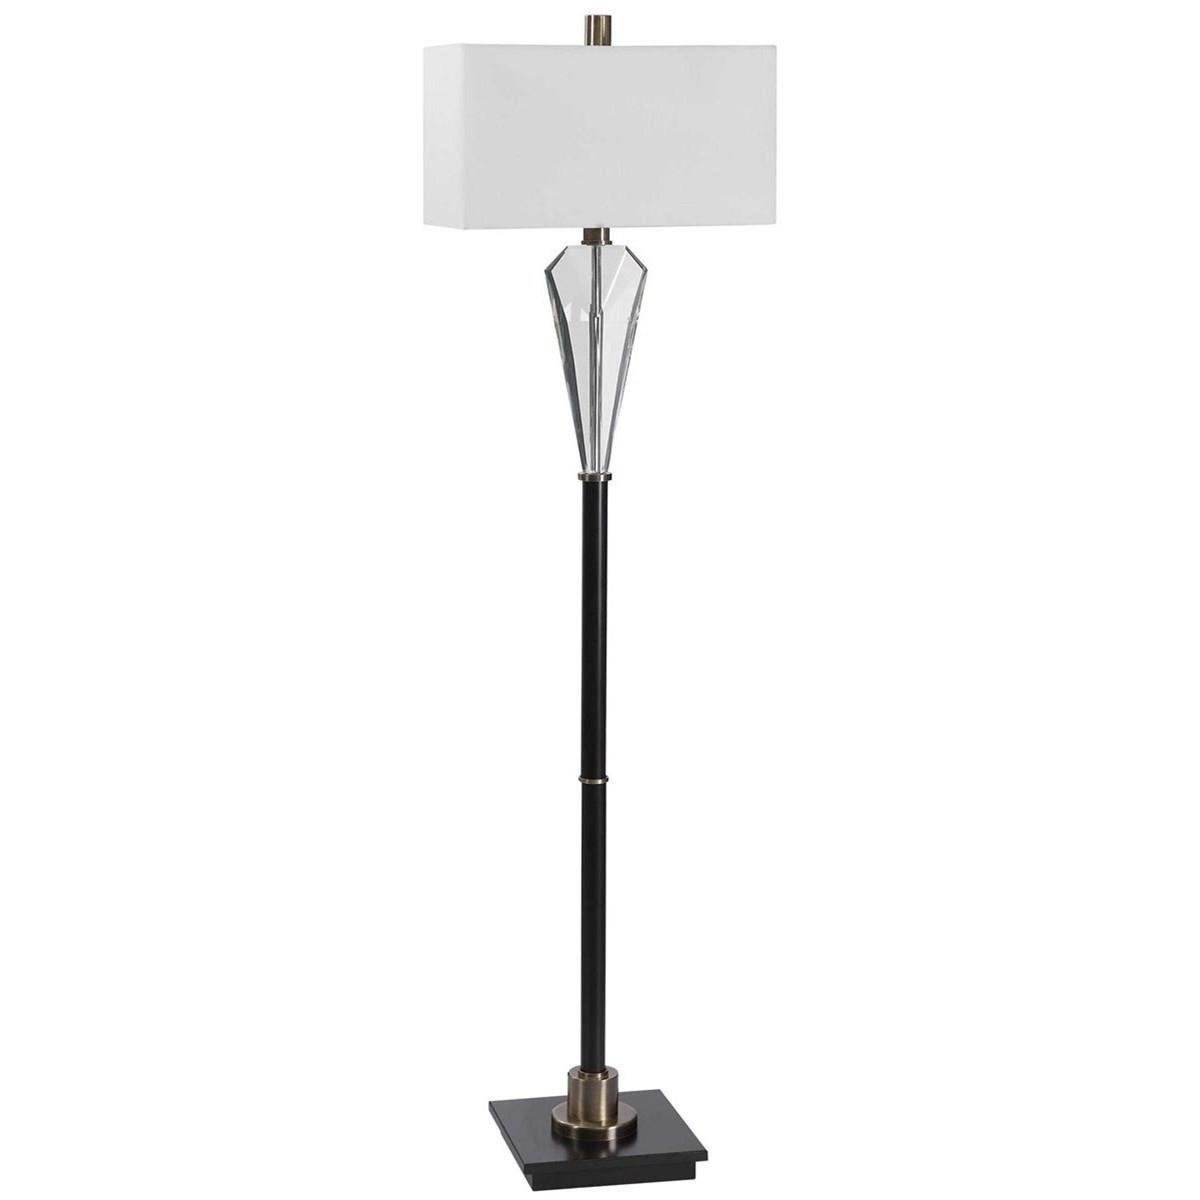 Uttermost Floor Lamps 28198 1 Cora Contemporary Floor Lamp Dunk Bright Furniture Floor Lamps